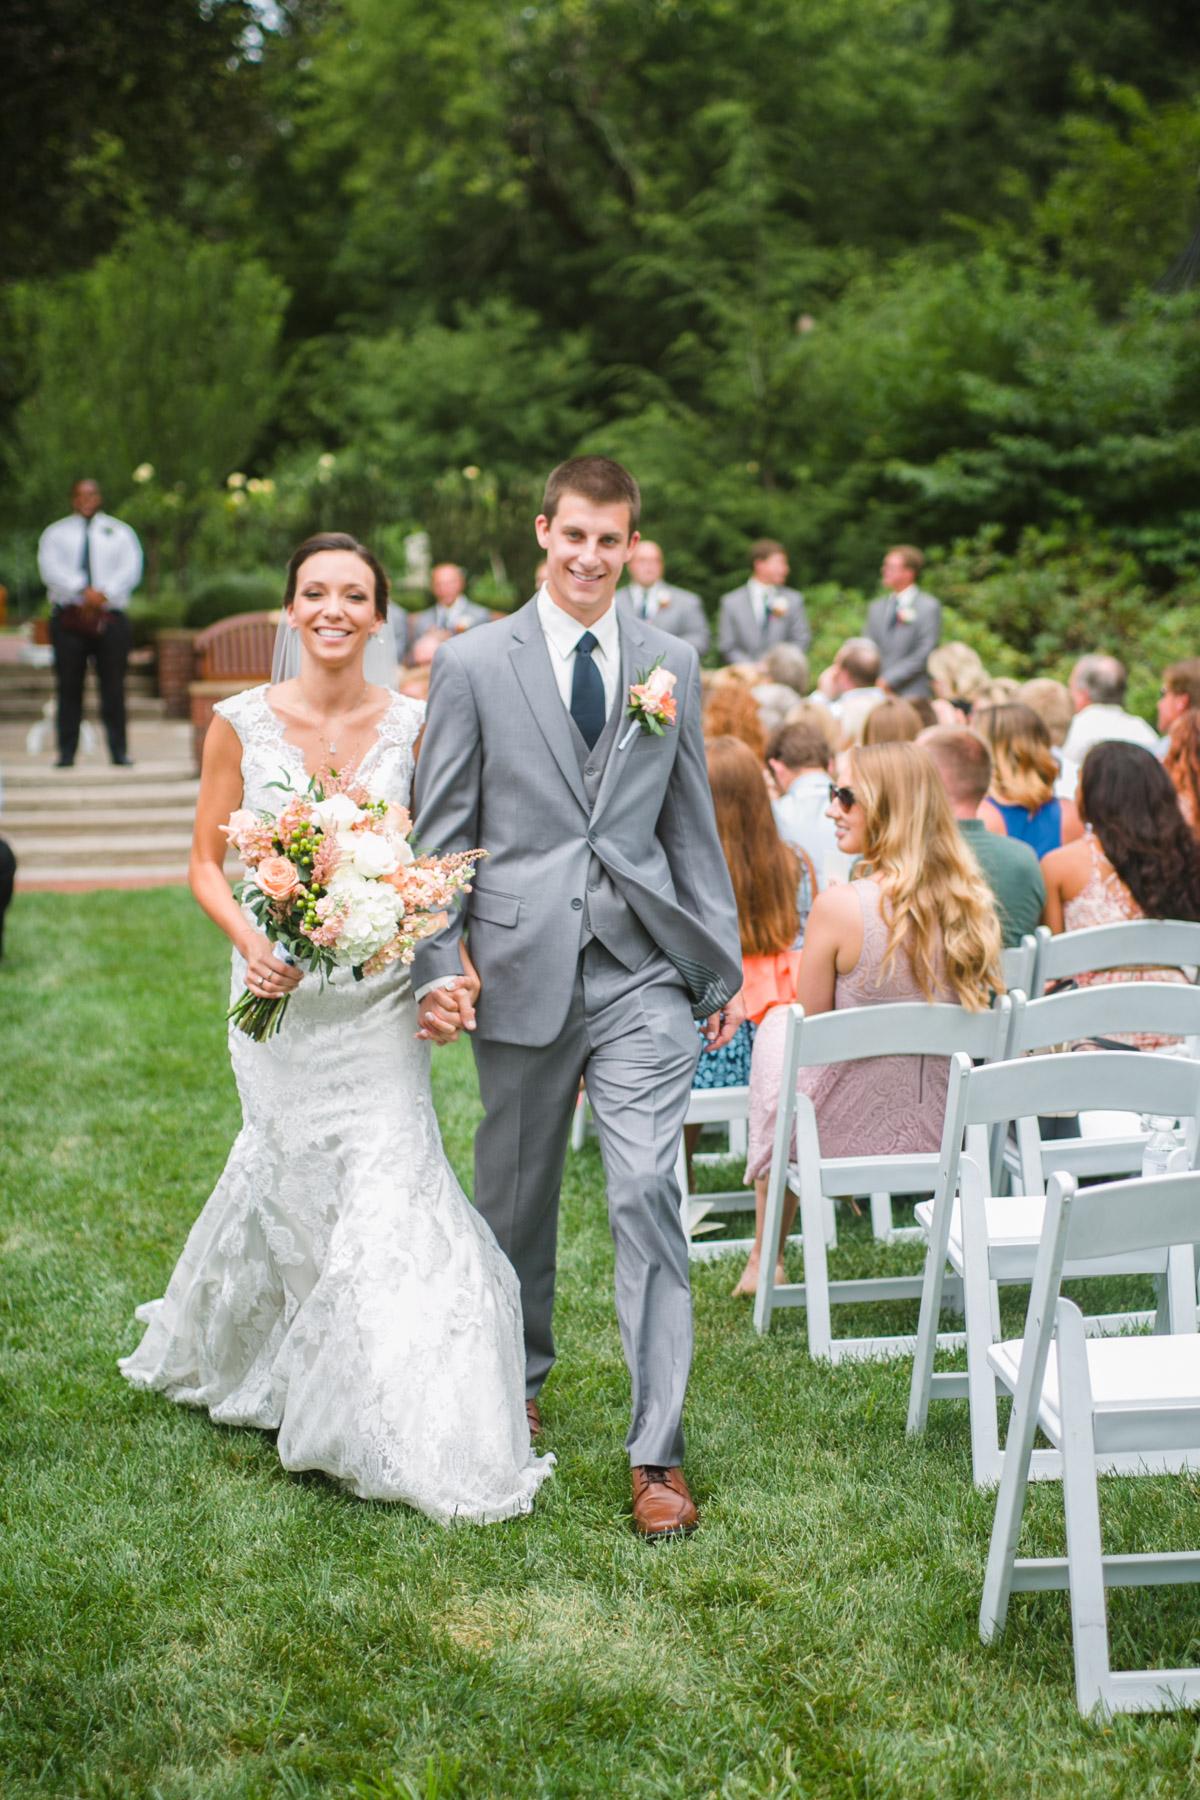 wildwood-park-wedding-photos-36.jpg